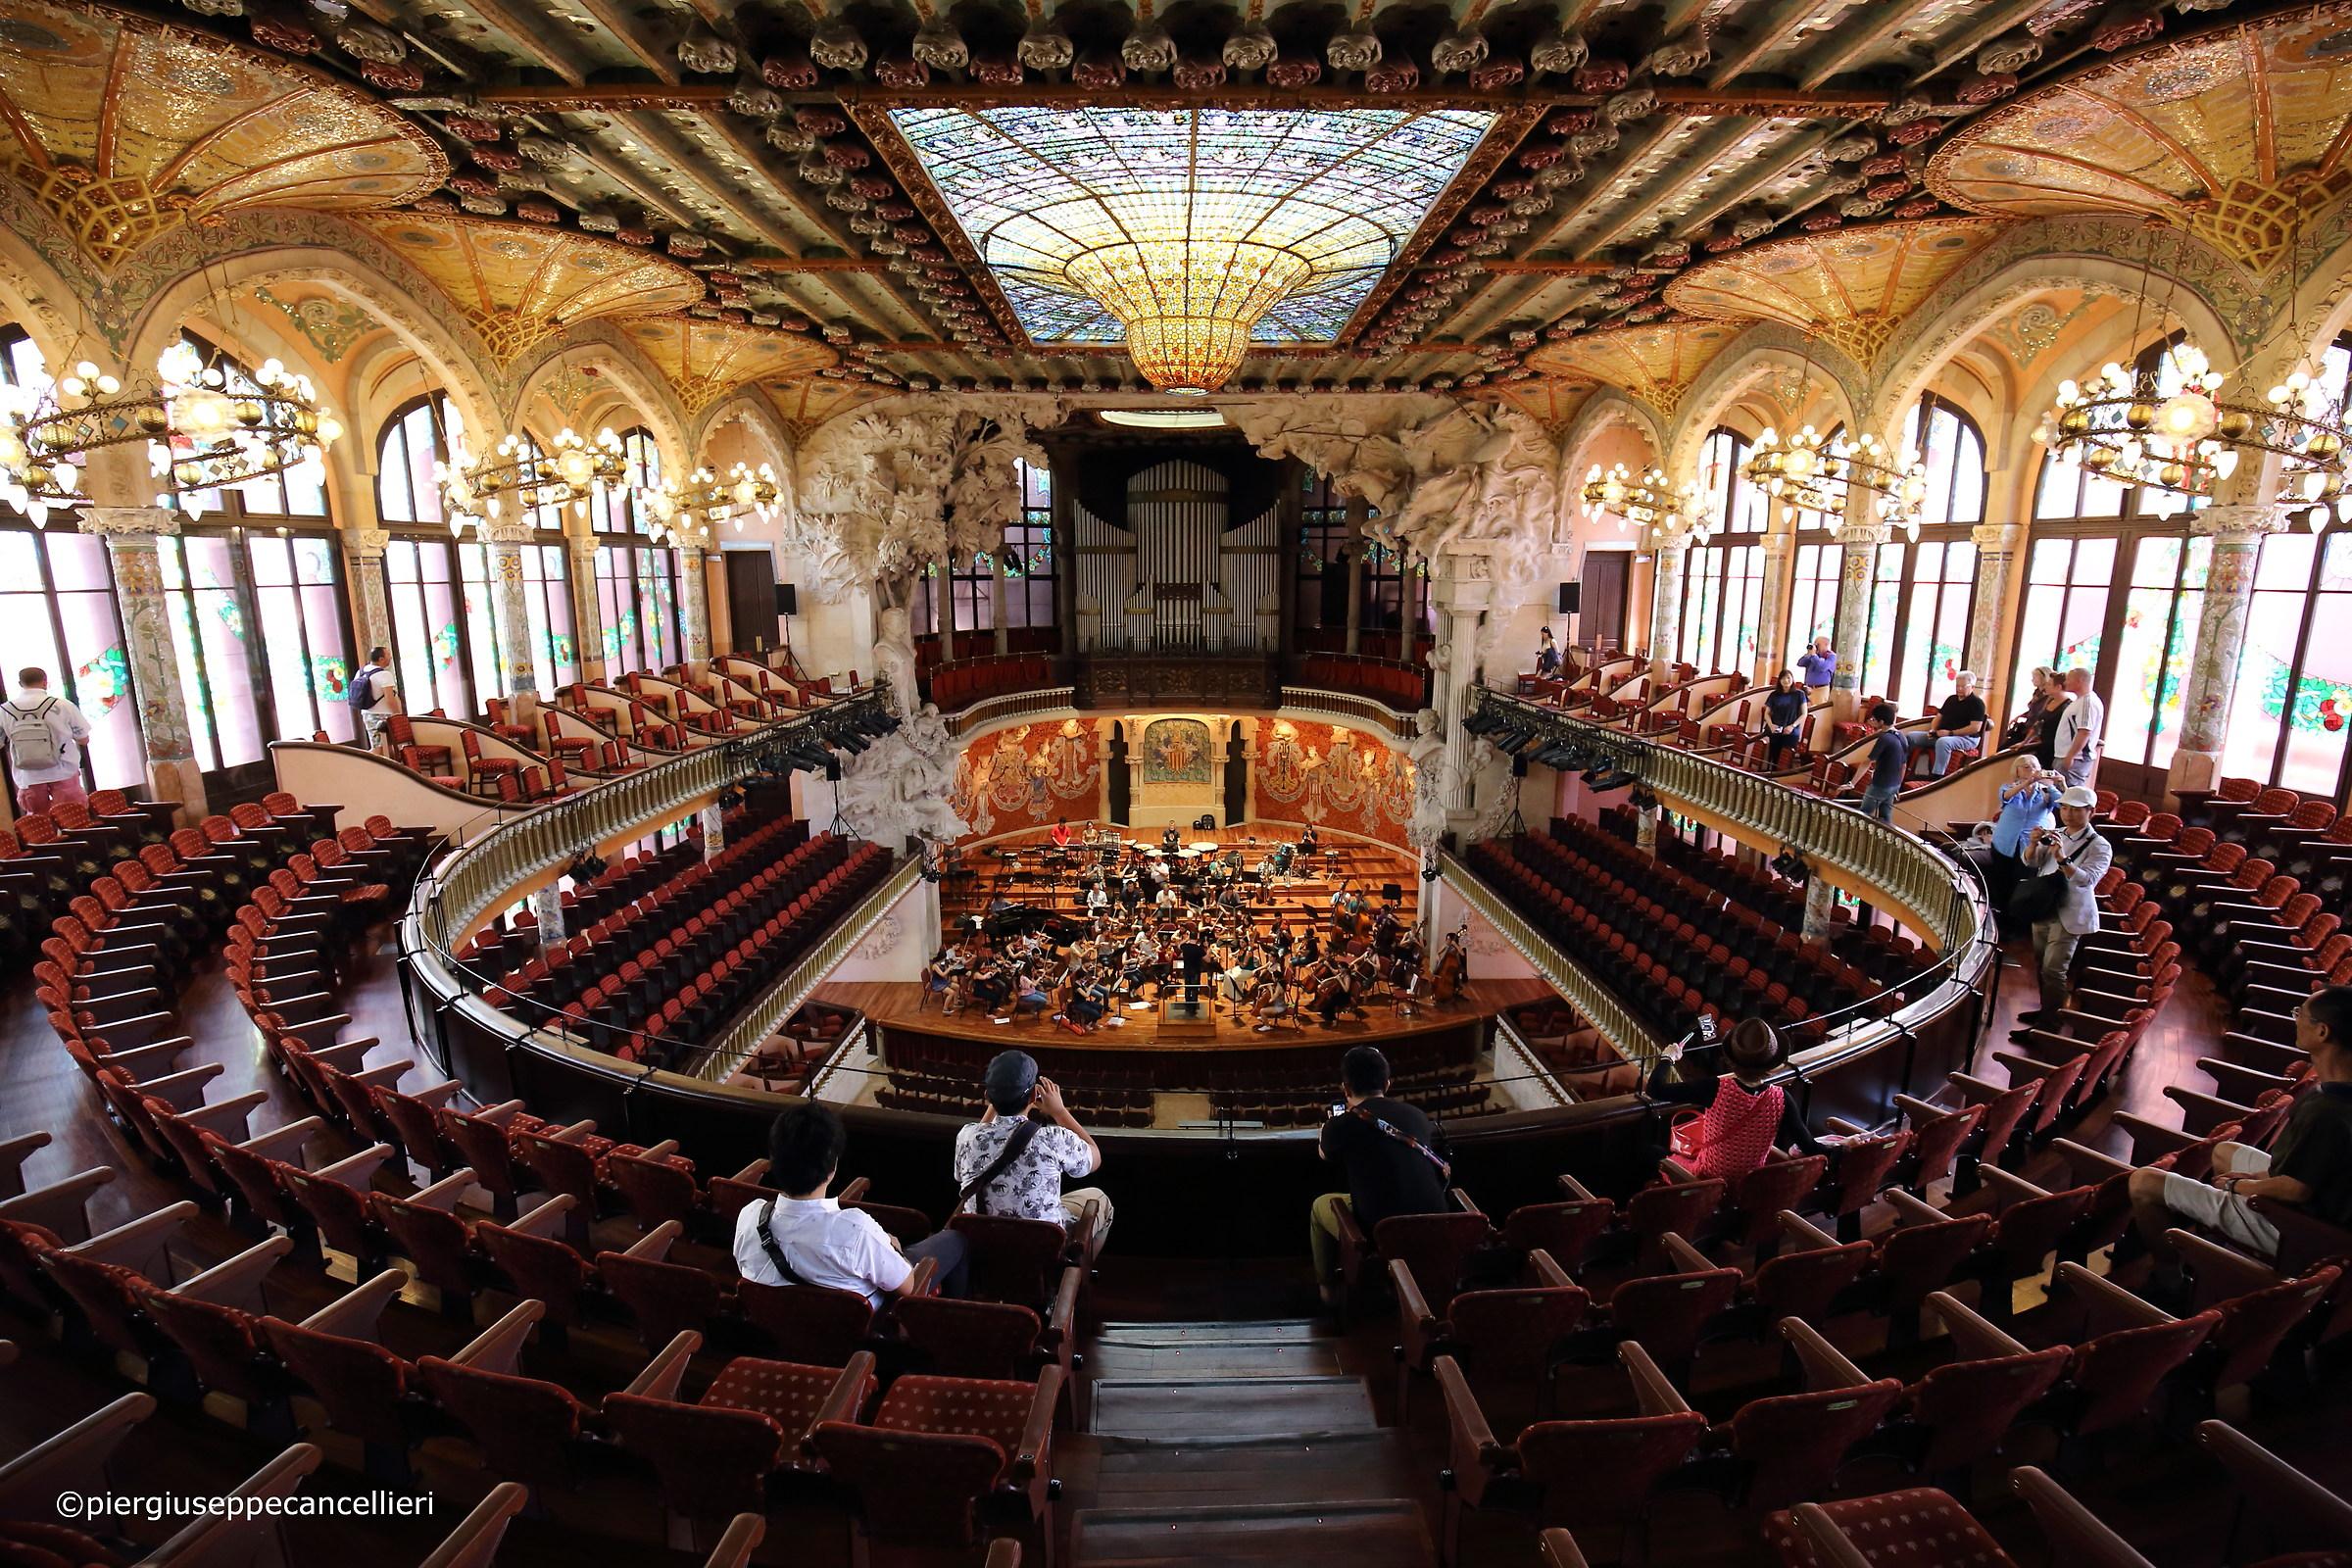 Palau Musica Concert Hall...